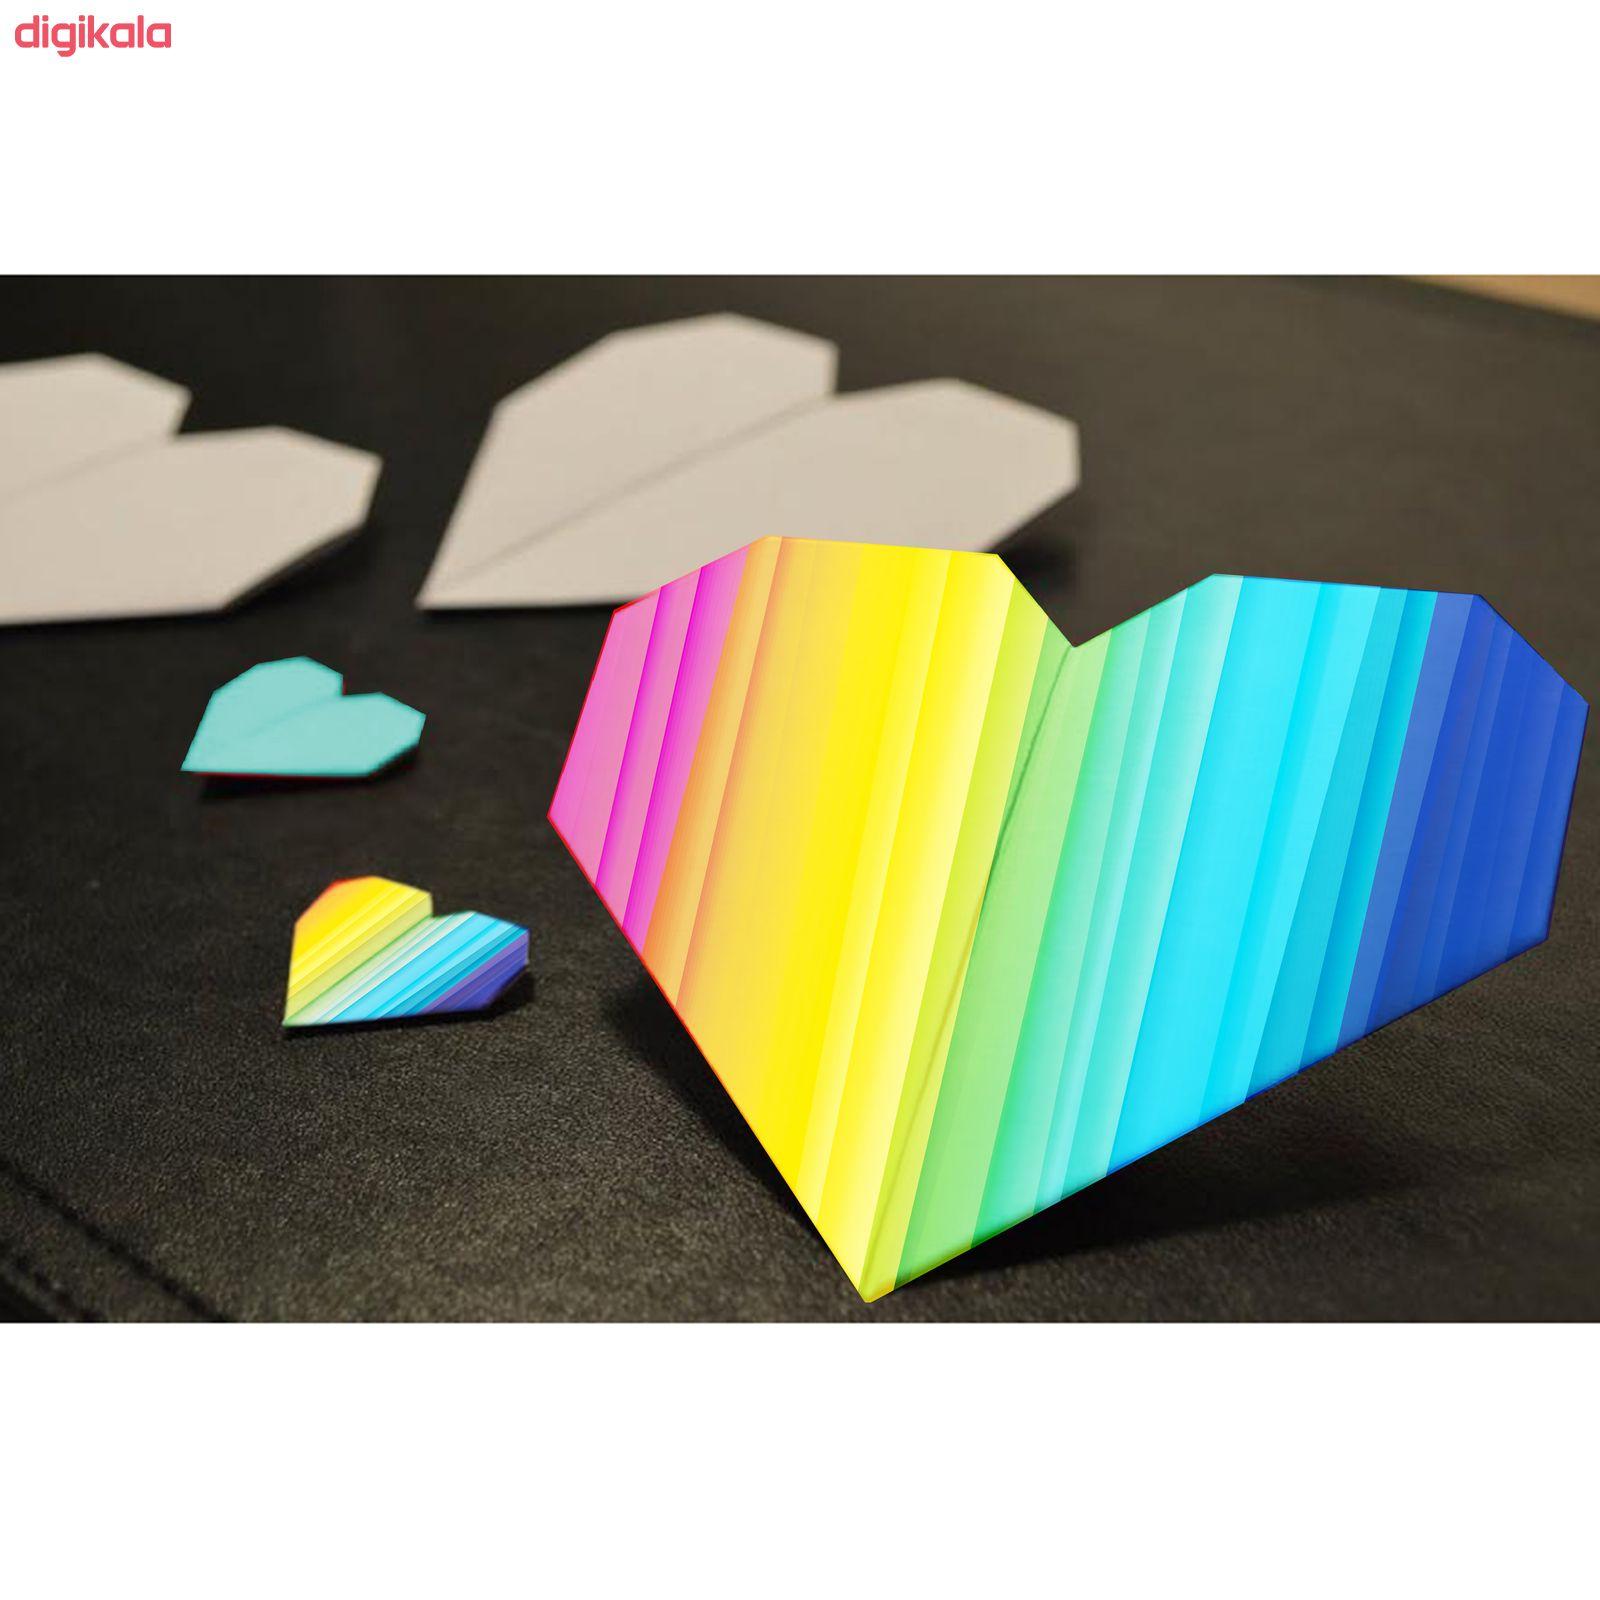 کاغذ رنگی A4 مستر راد مدل رنگارنگ بسته 10 عددی main 1 5